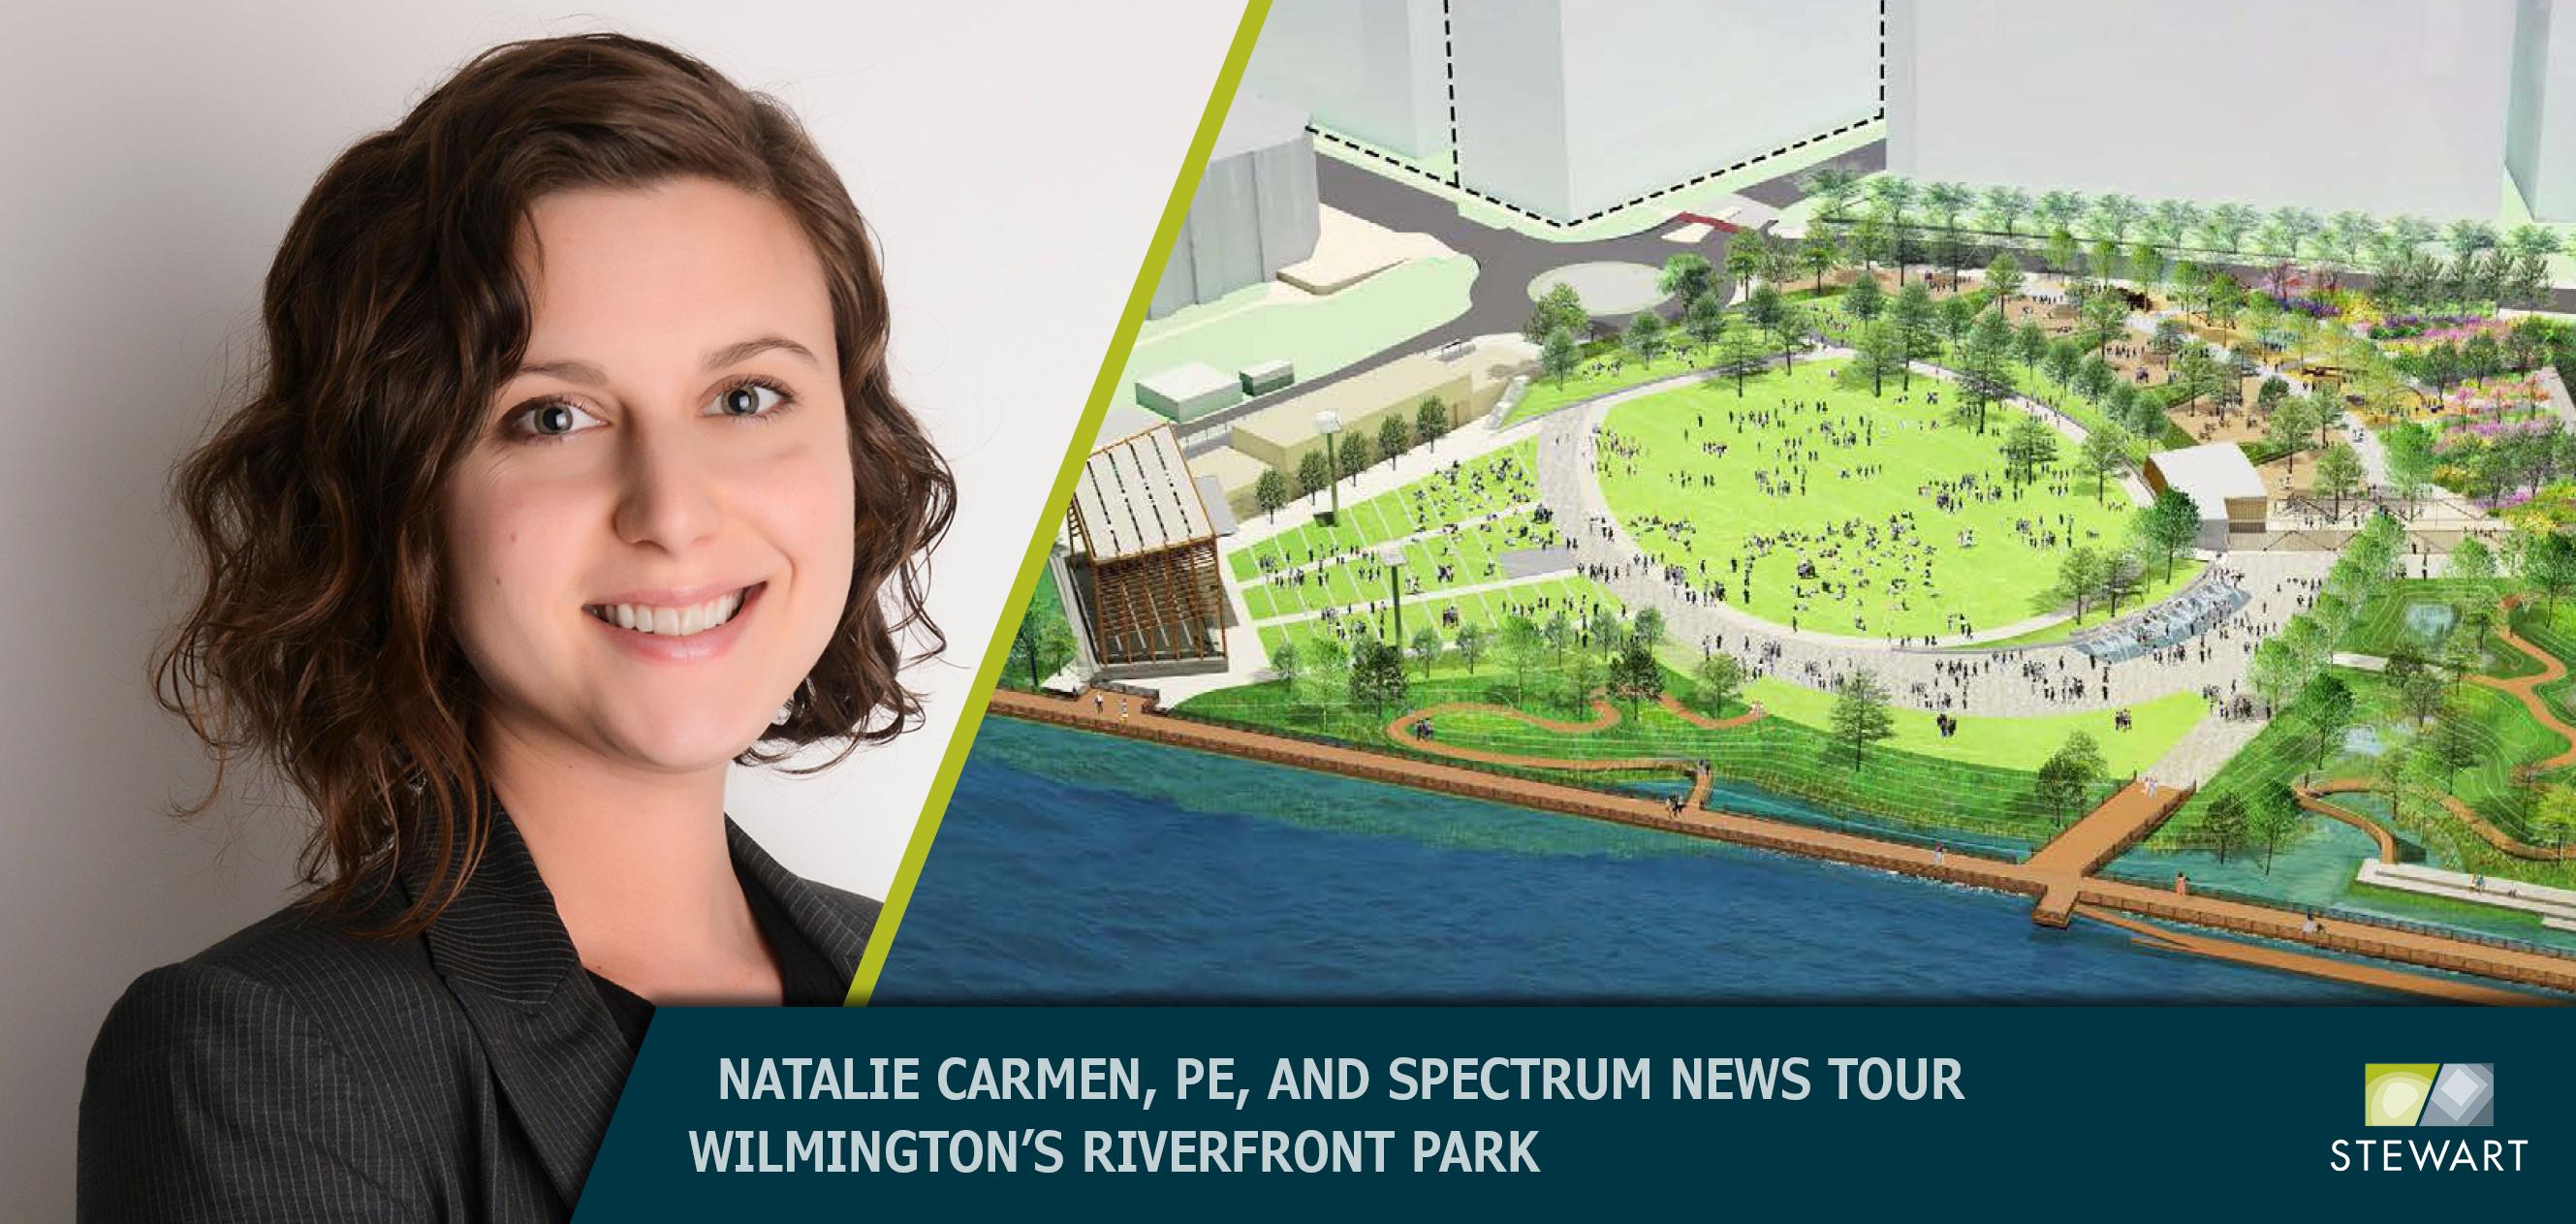 Natalie Carmen, PE, and Spectrum News Tour Wilmington's Forthcoming Riverfront Park